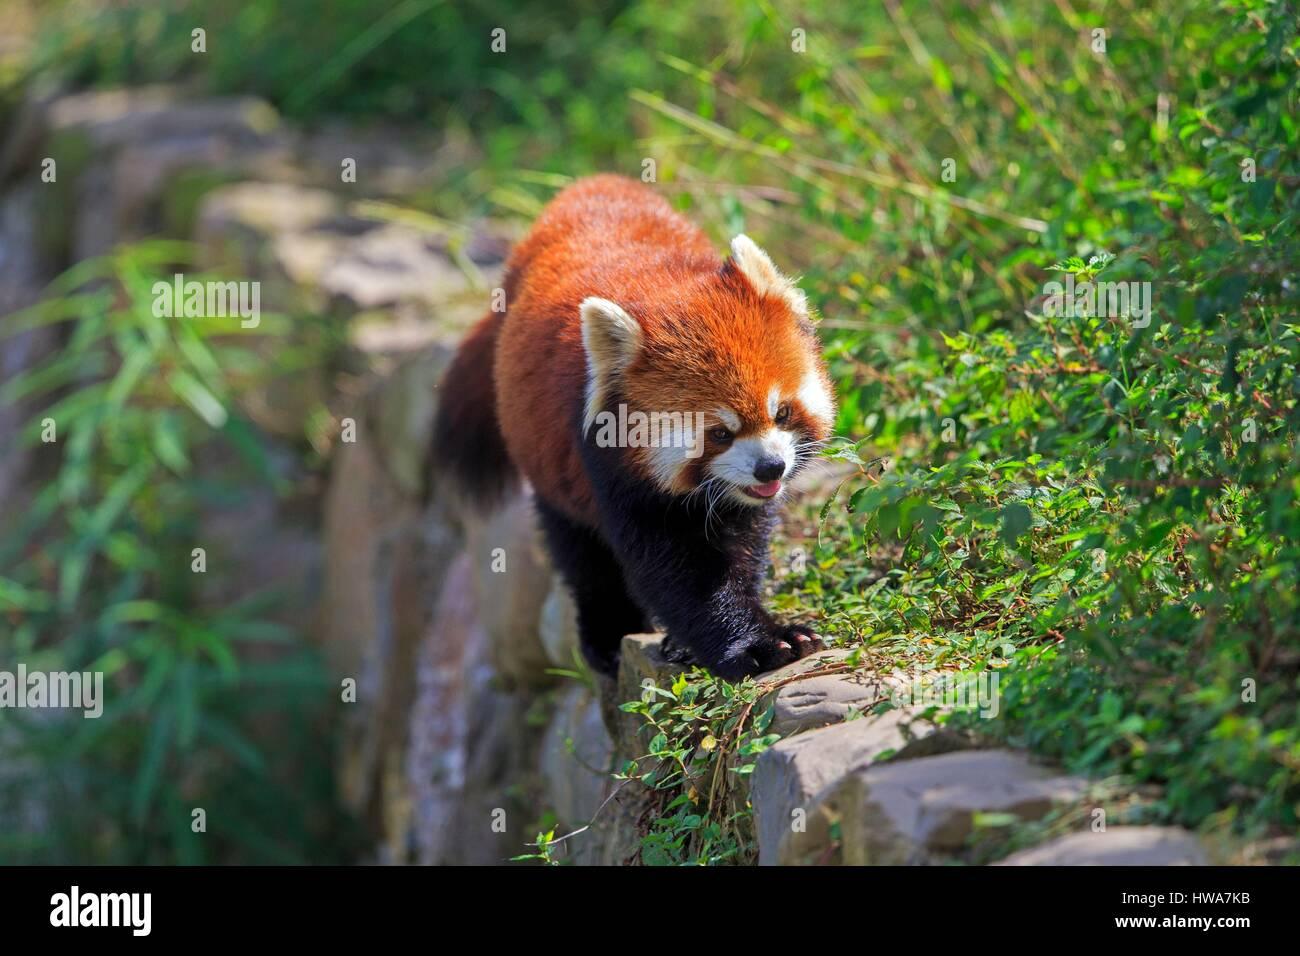 China, Shanghai, la recherche de base de l'élevage du Panda Géant ou Chengdu Panda Base, le panda Photo Stock